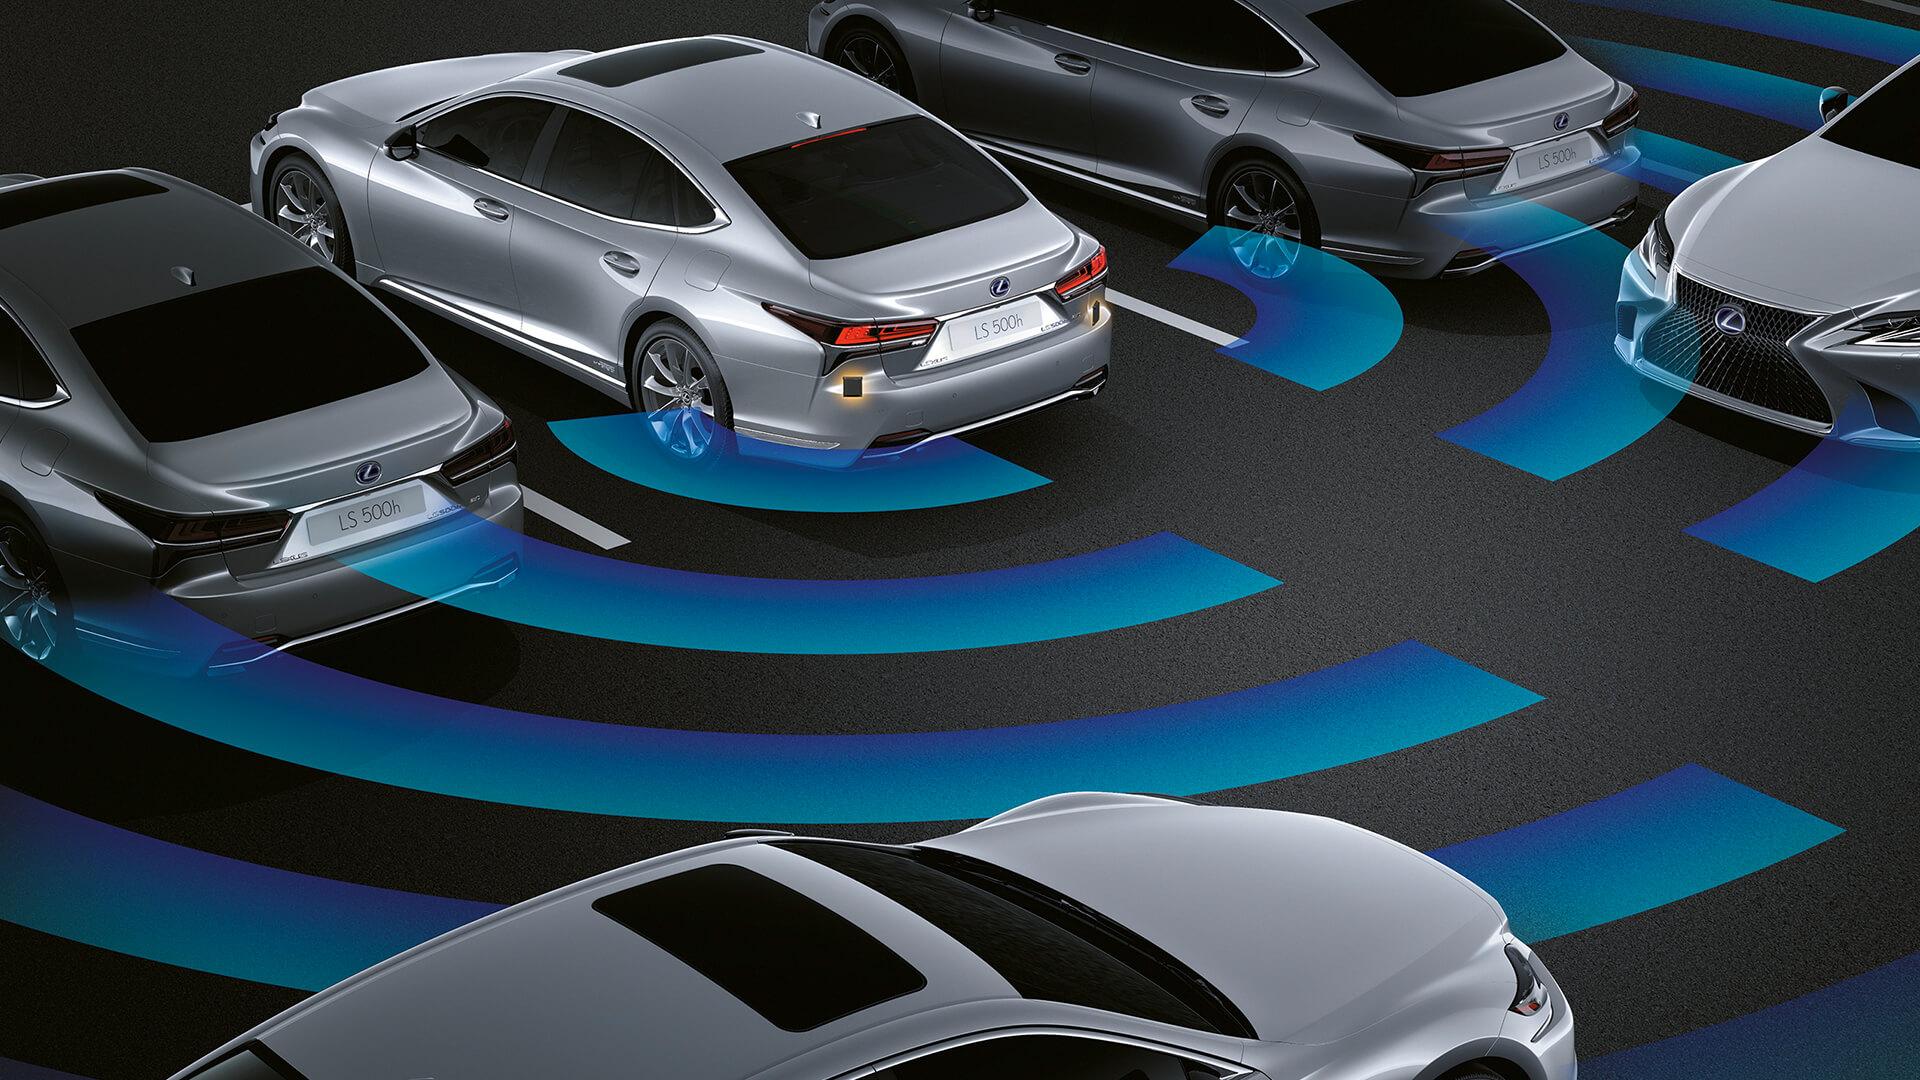 2018 lexus ls features rear cross traffic alert and braking